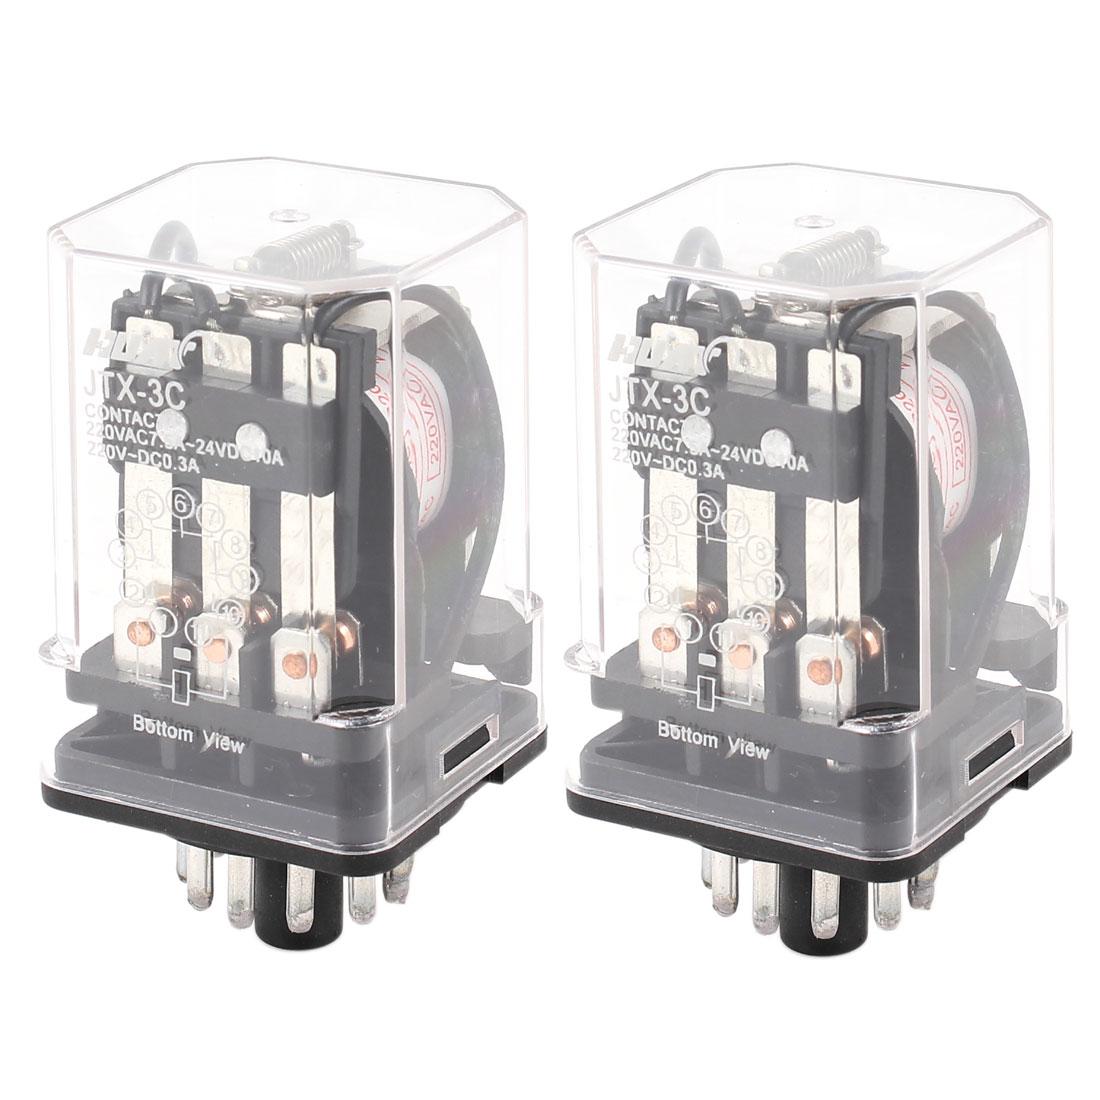 JTX-3C AC 220V Coil General Purpose Power Relay 11 Pins 3PDT 3P2T 2 Pcs